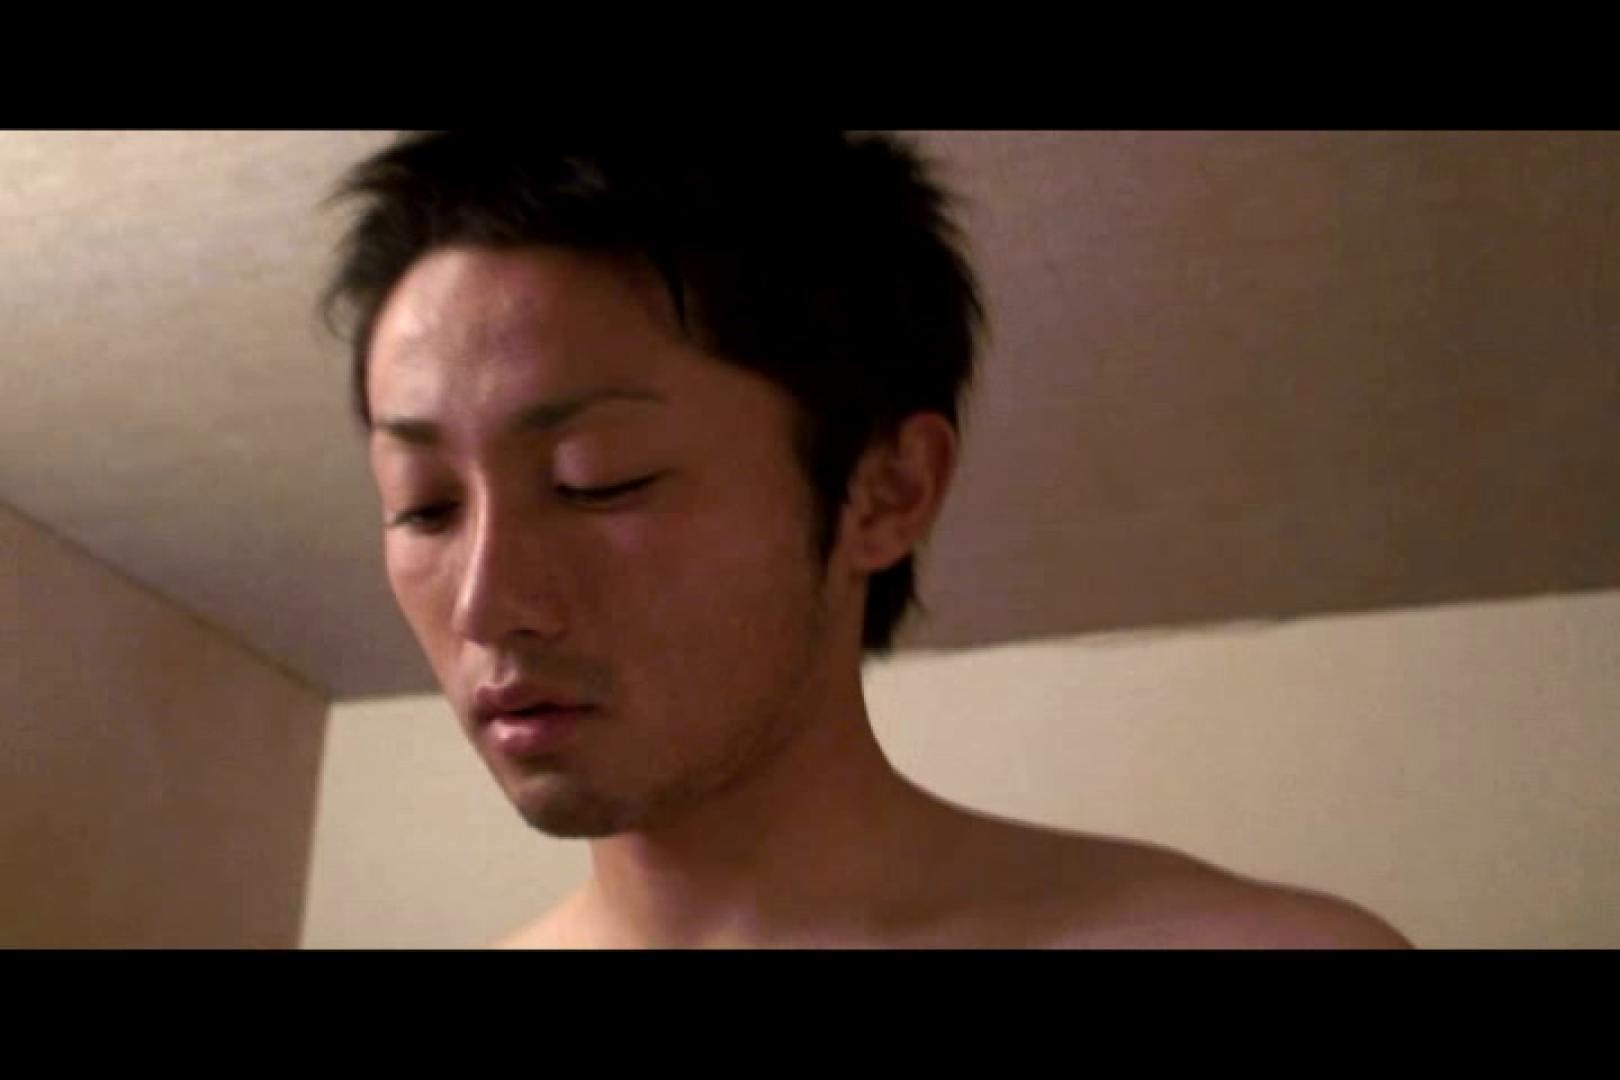 Bistro「イケメン」~Mokkori和風仕立て~vol.01 無修正 ゲイ無修正ビデオ画像 111pic 85